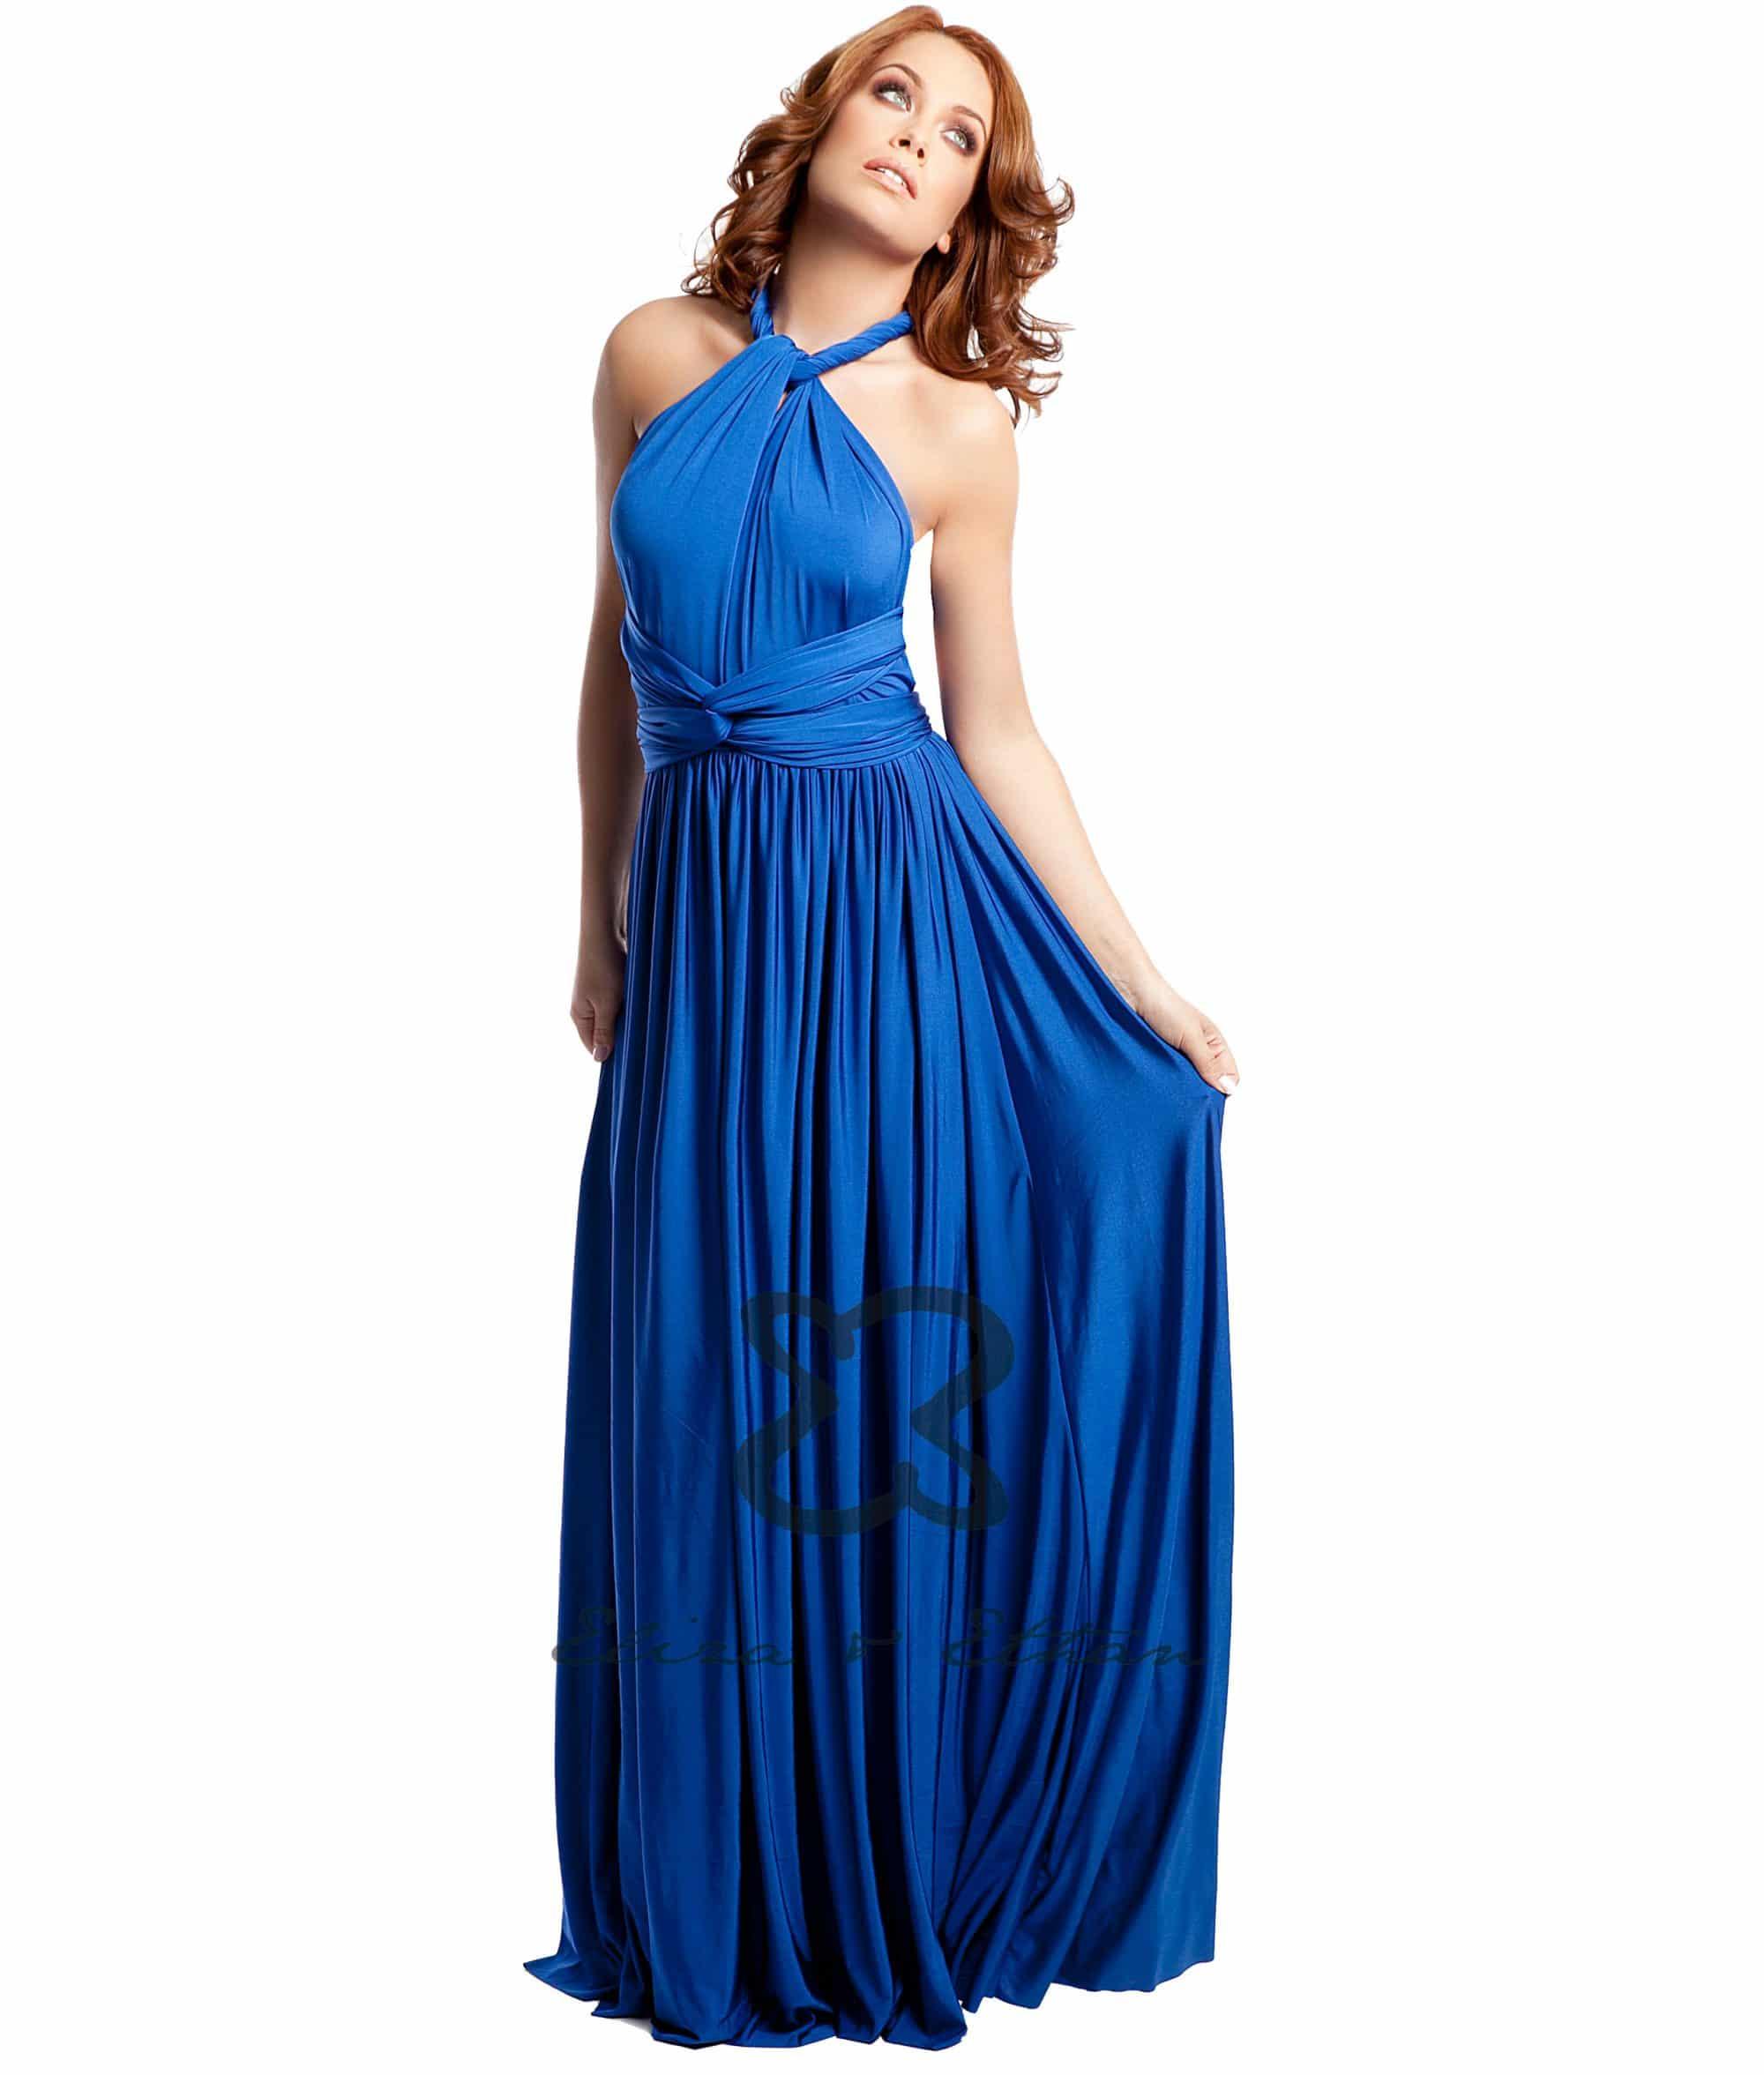 Eliza & Ethan Sapphire Multiwrap Dress Alila